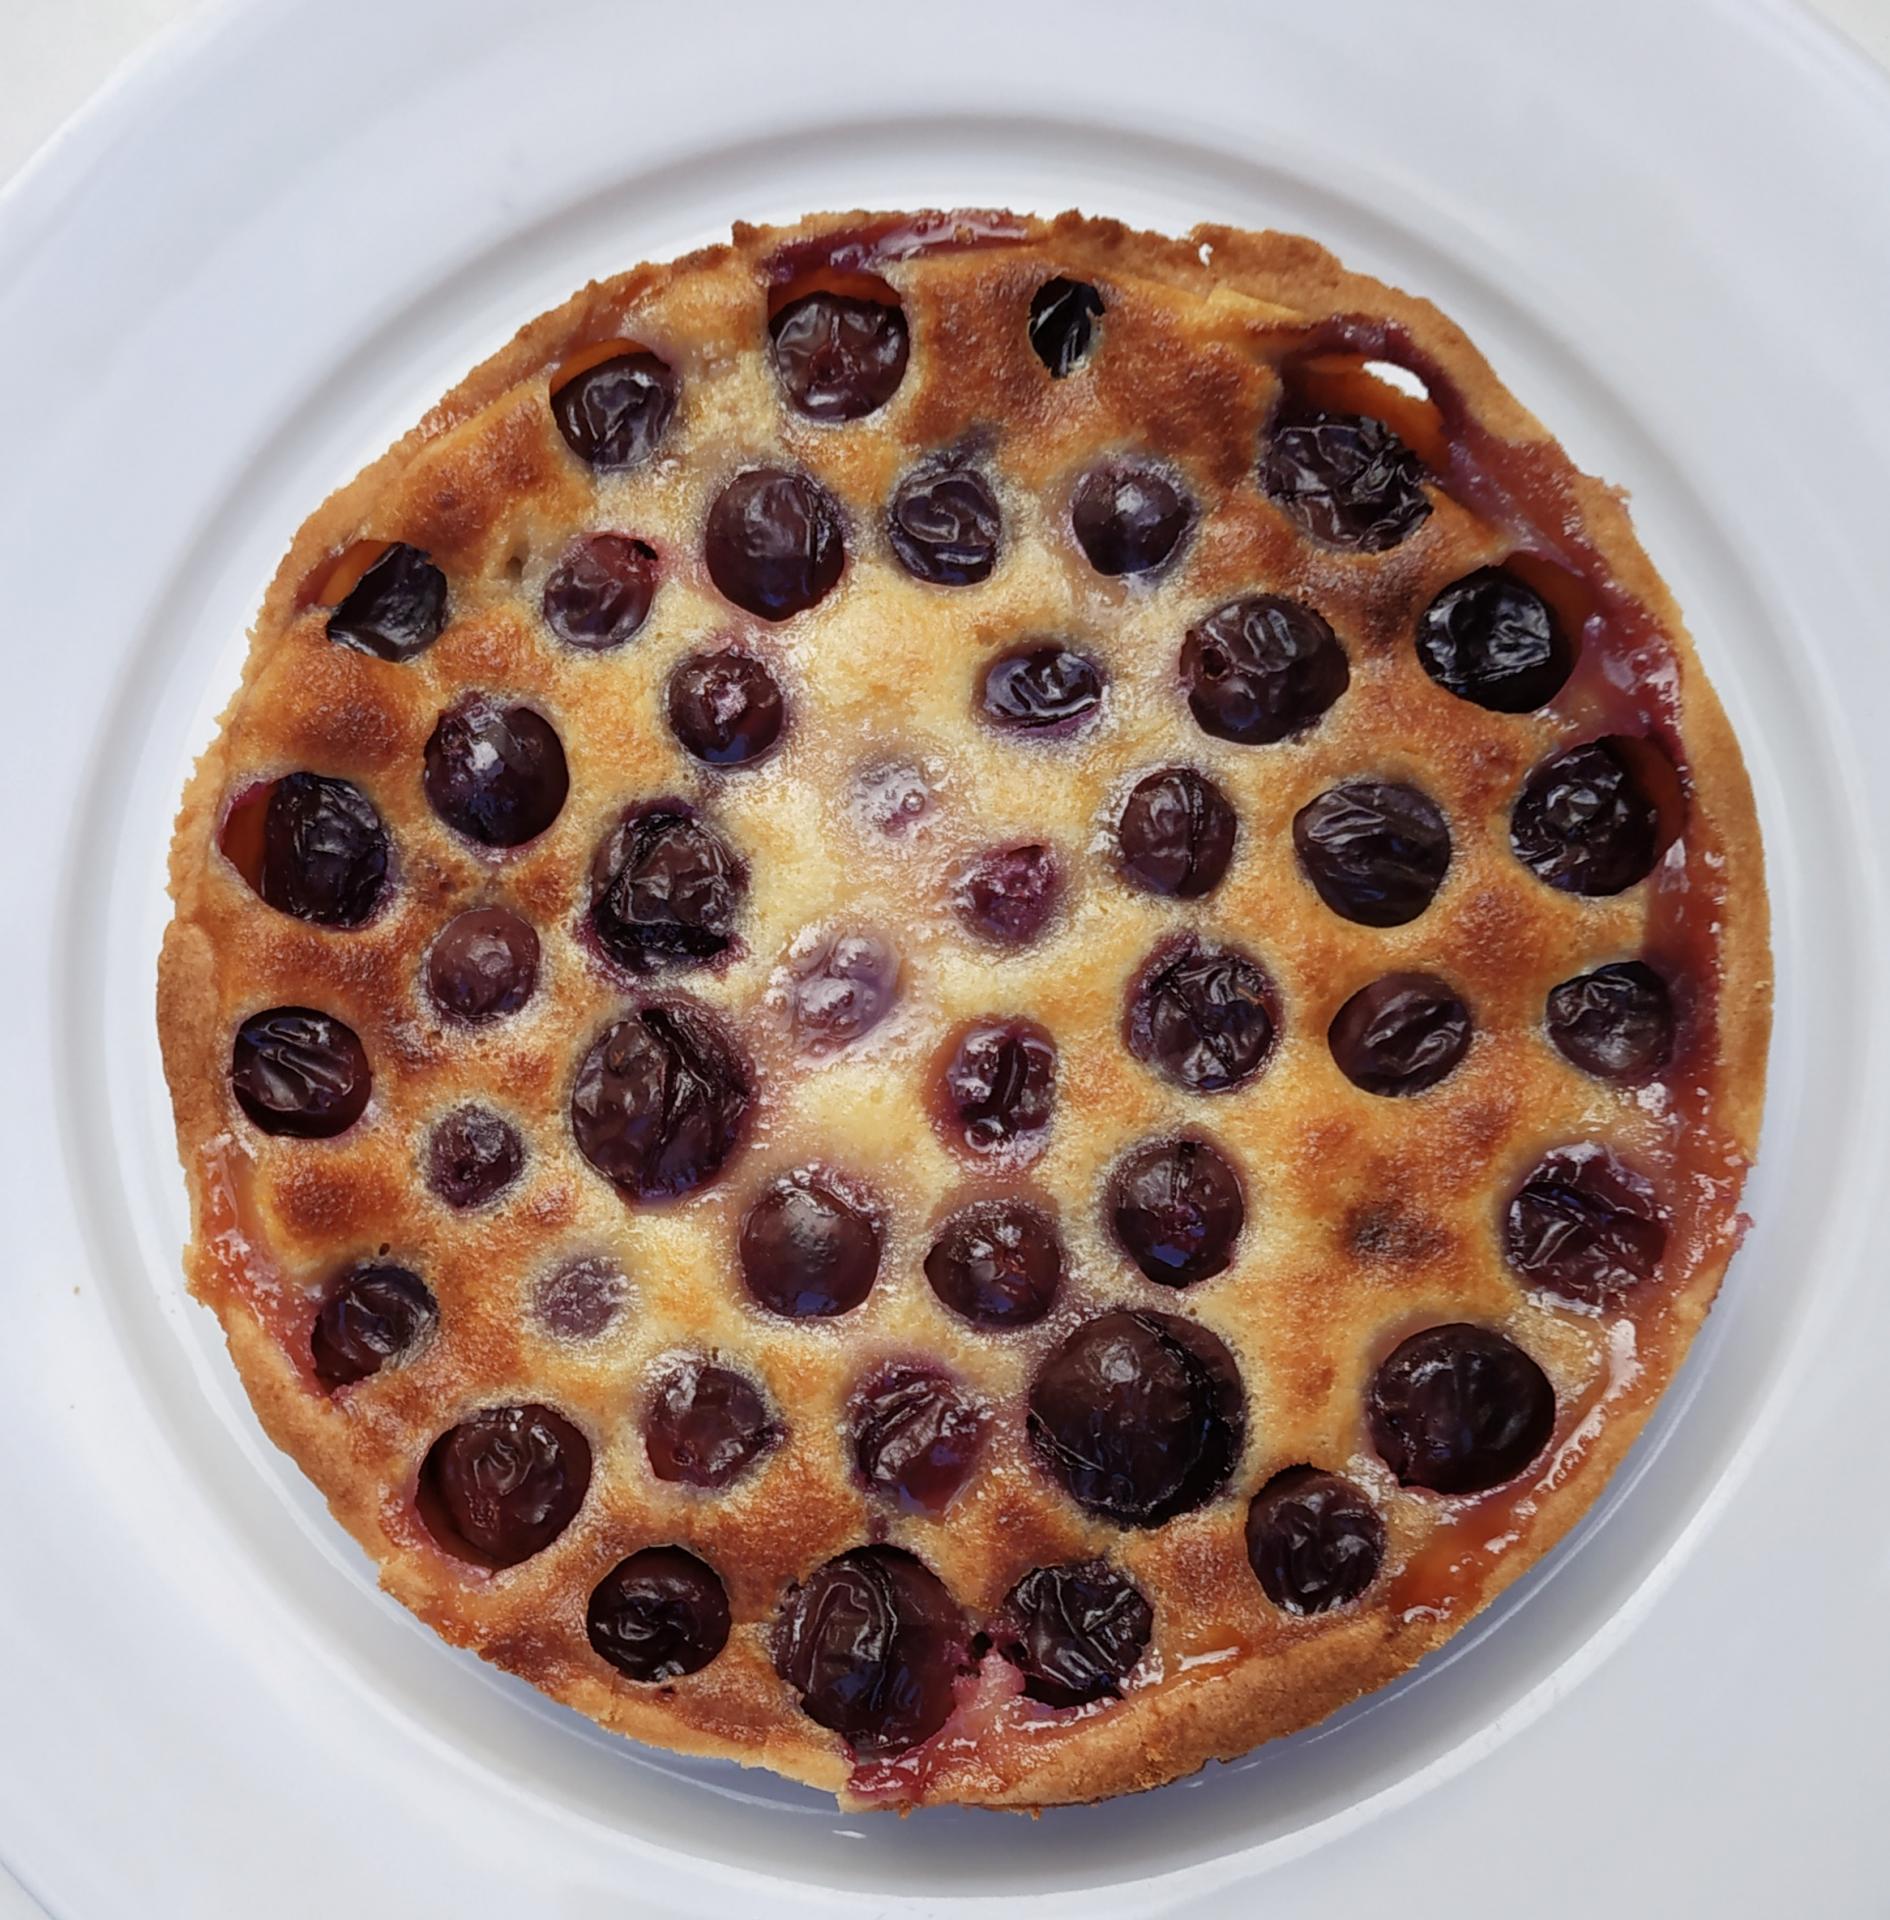 Tarte clafoutis aux raisins noirs